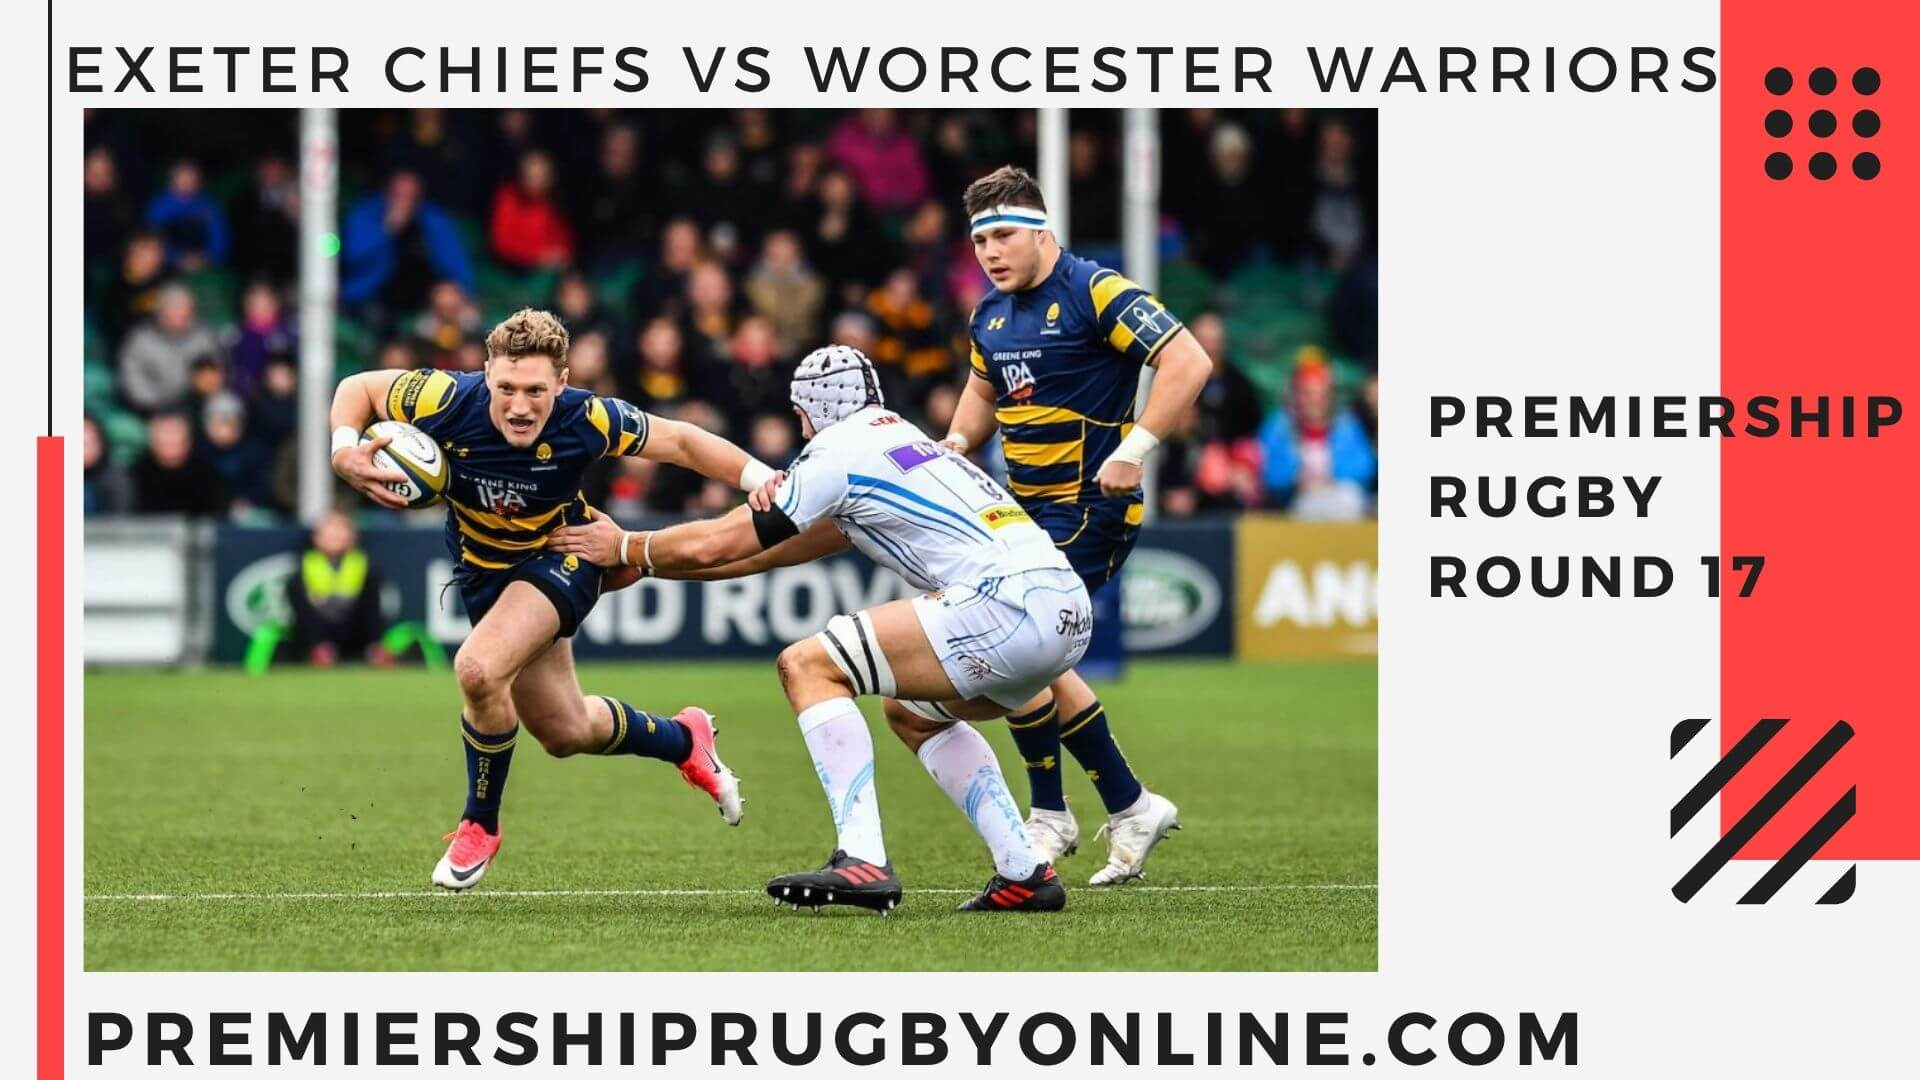 Exeter Chiefs vs Worcester Warriors  Postponed   Round 17